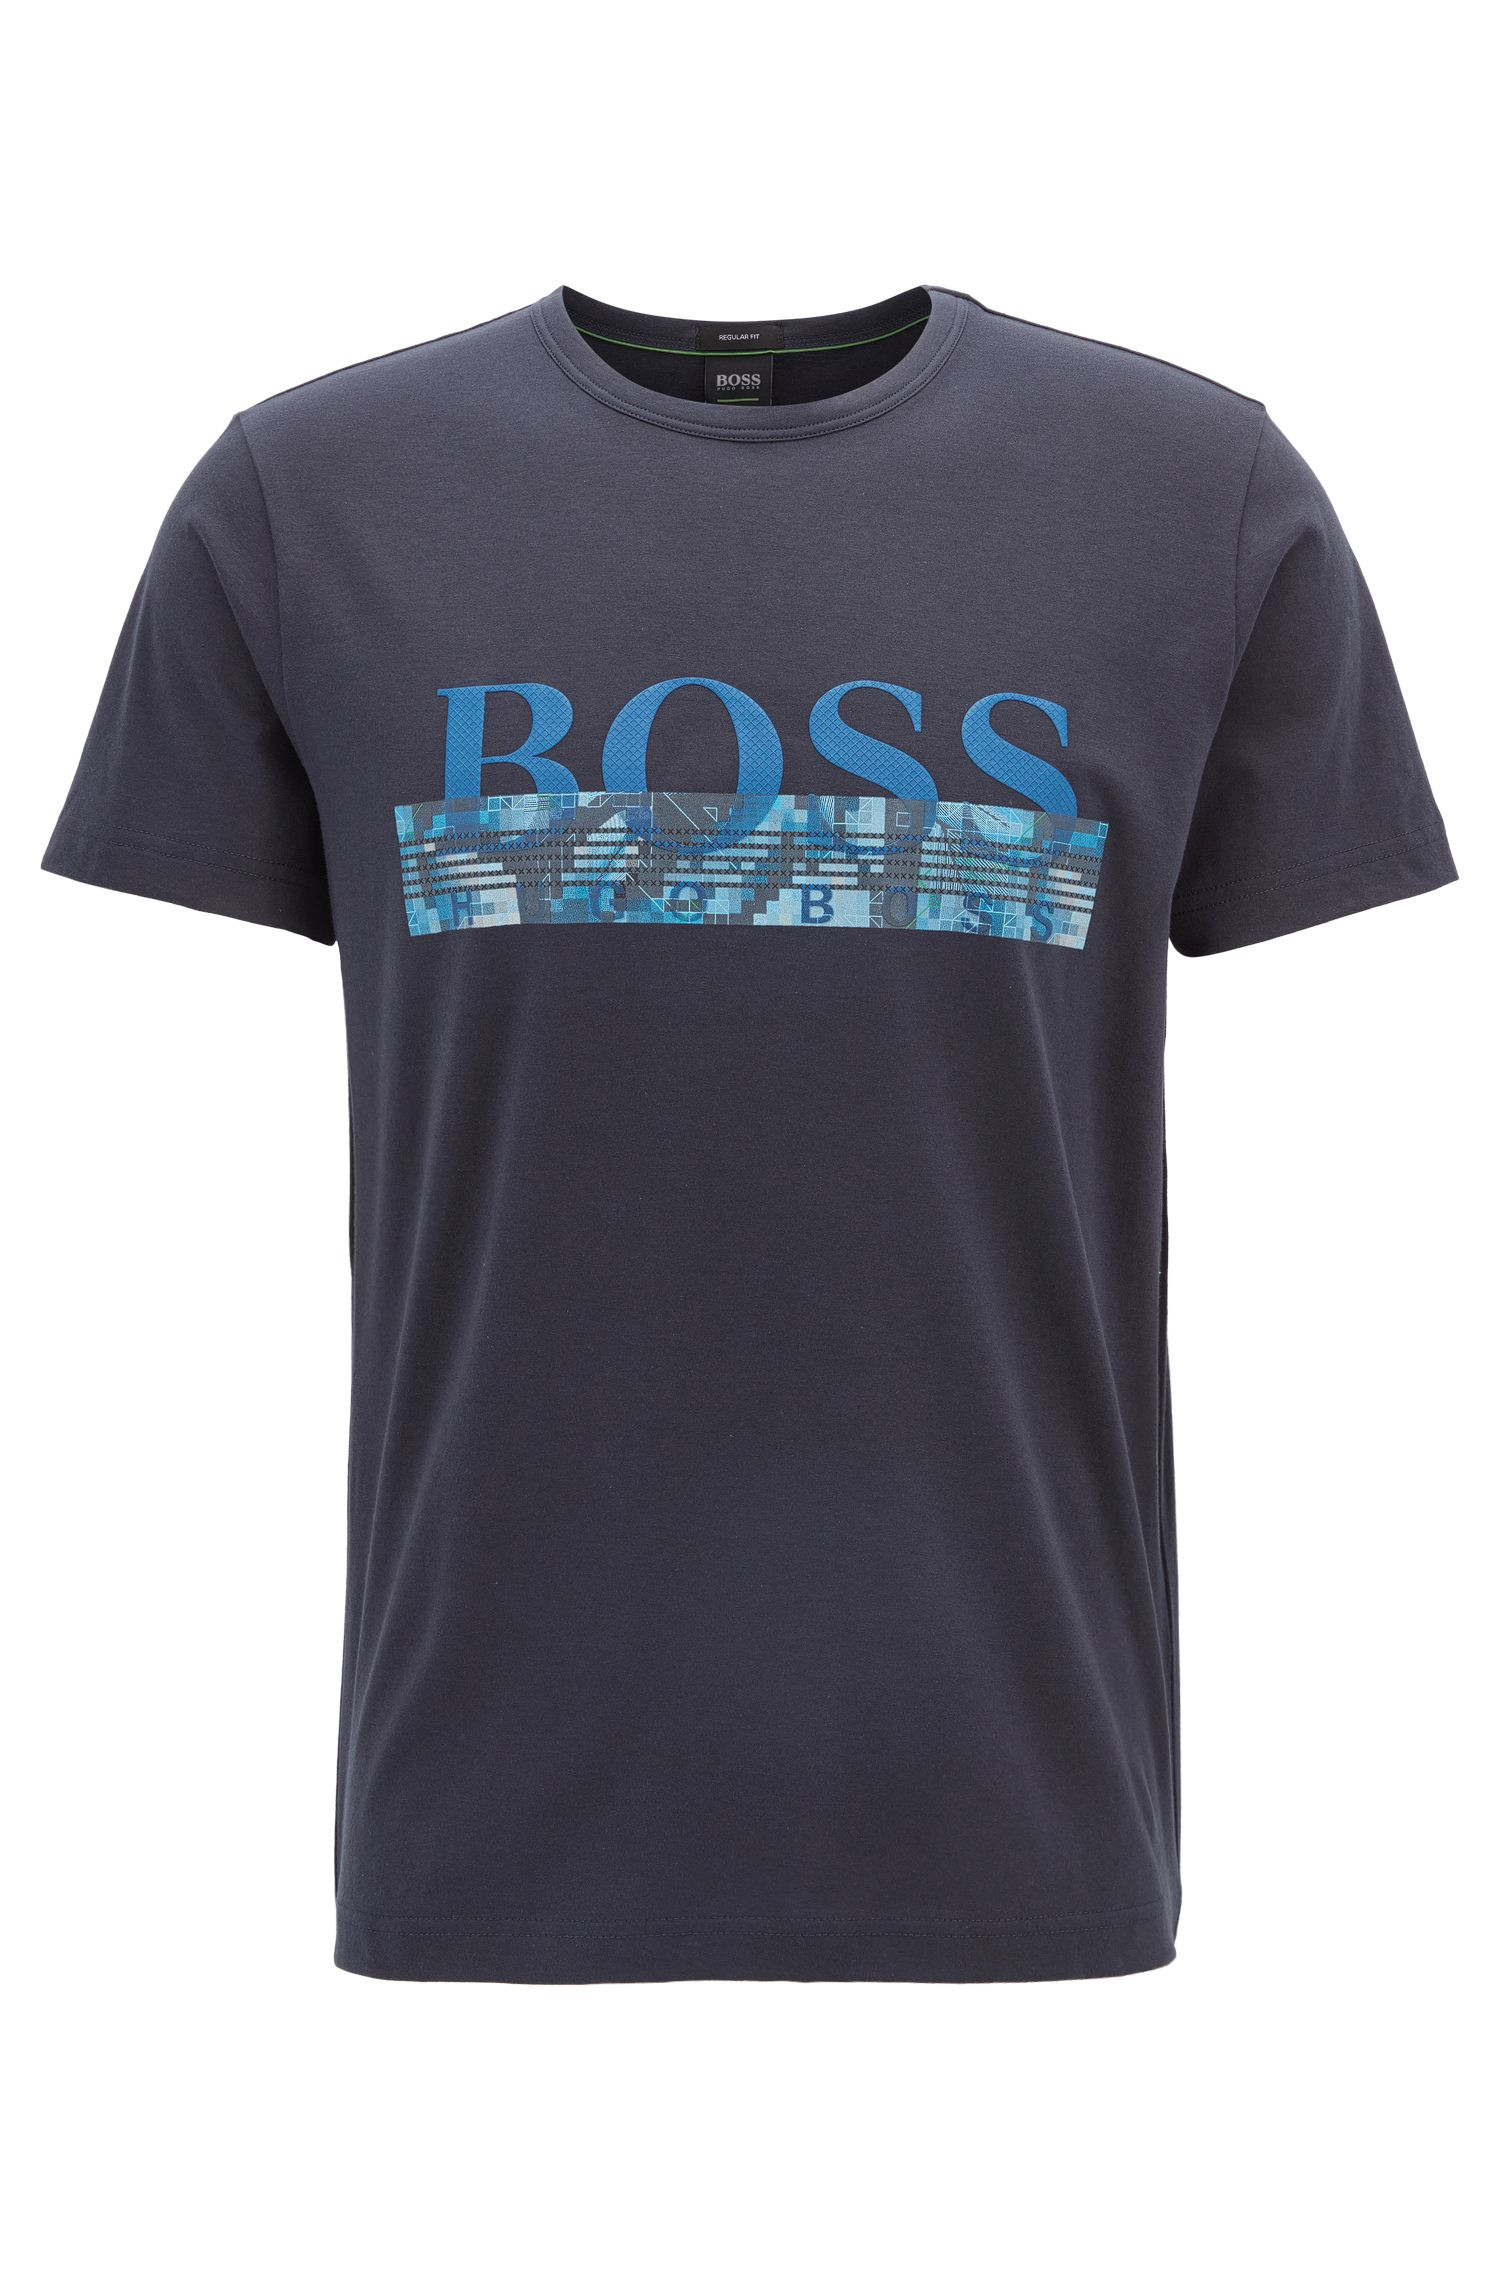 Cotton logo T-shirt with seasonal print